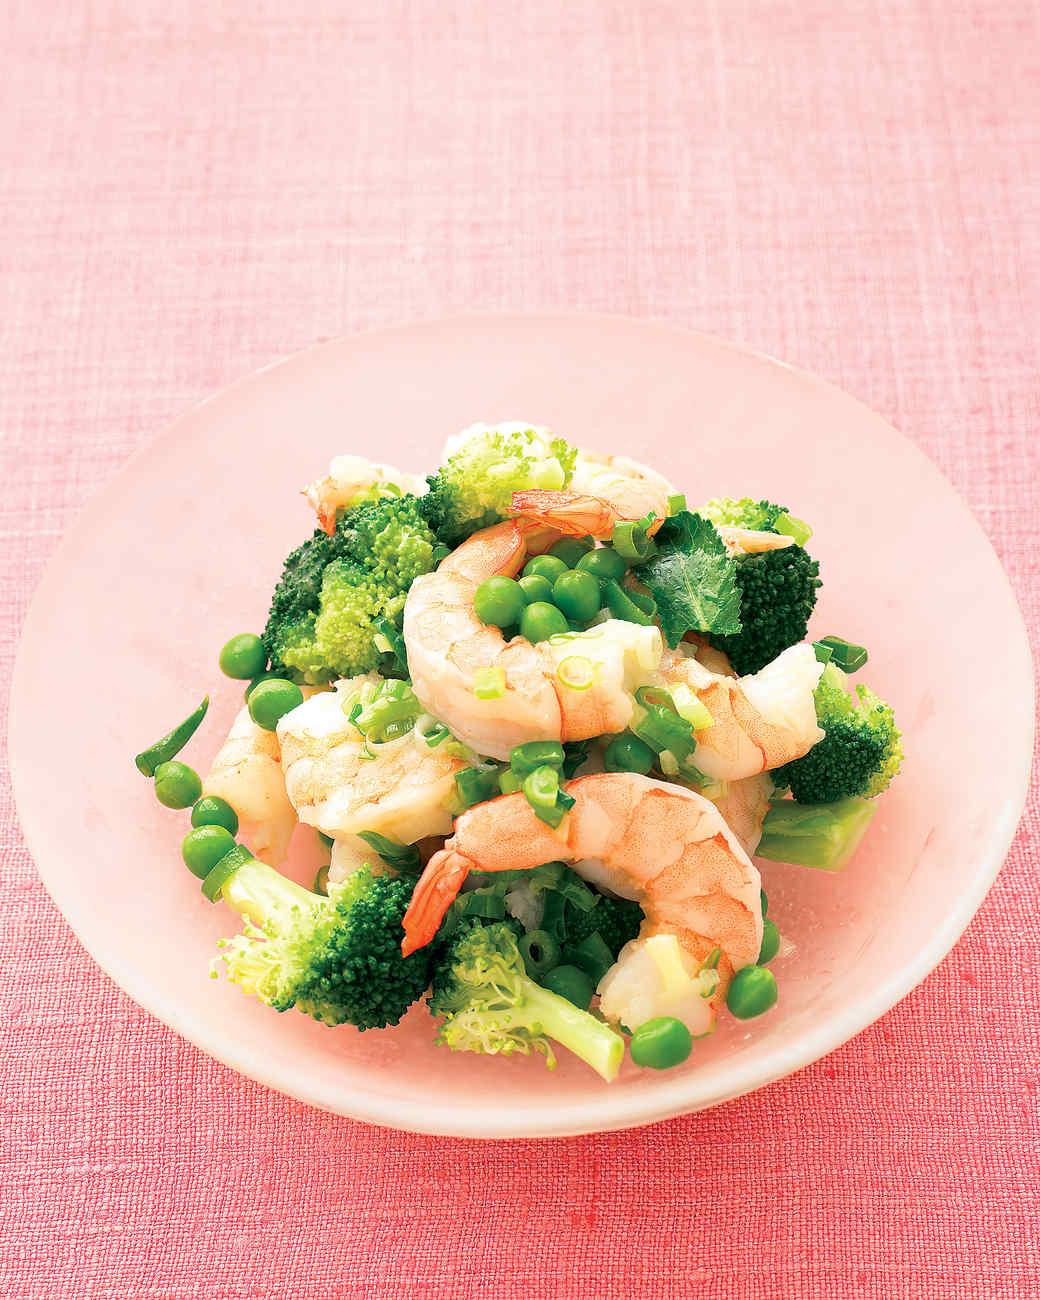 Lemony Sauteed Shrimp with Broccoli and Peas